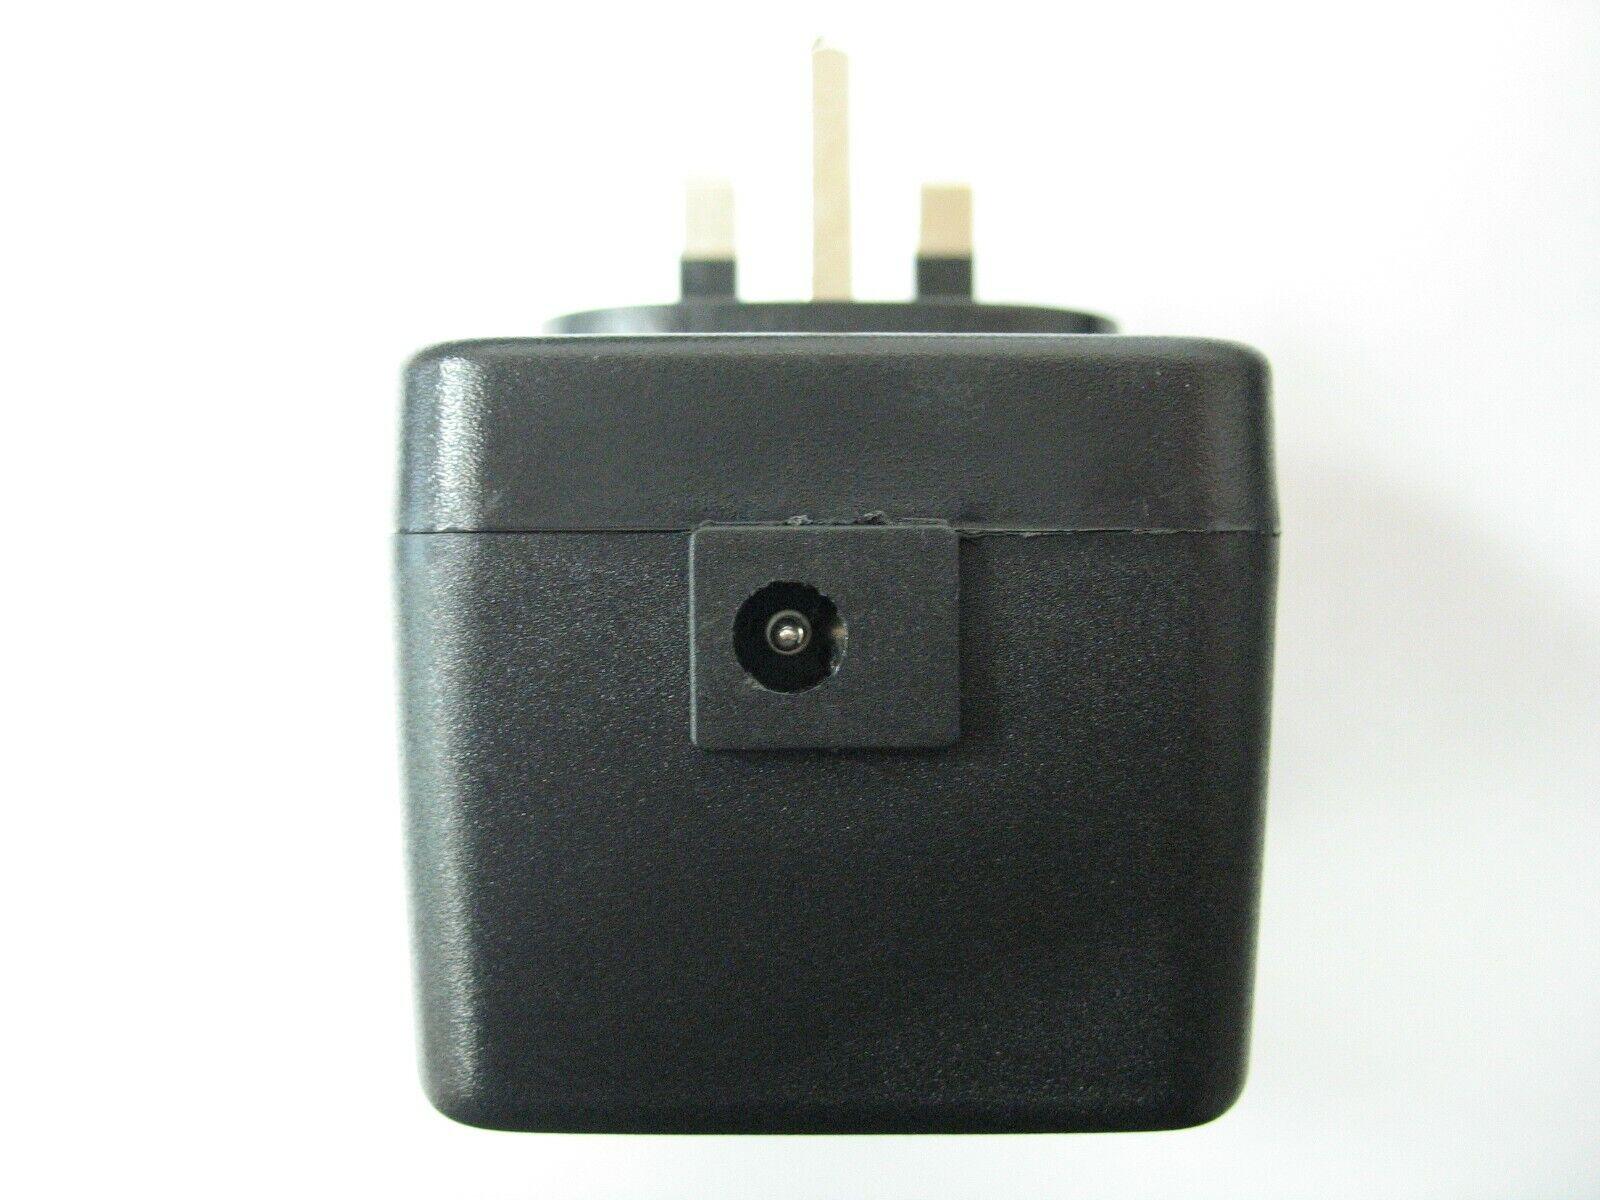 0.5 amp 24 volt Socket AC-AC (AC Output) Power Adaptor/Supply/Charger 12 watt